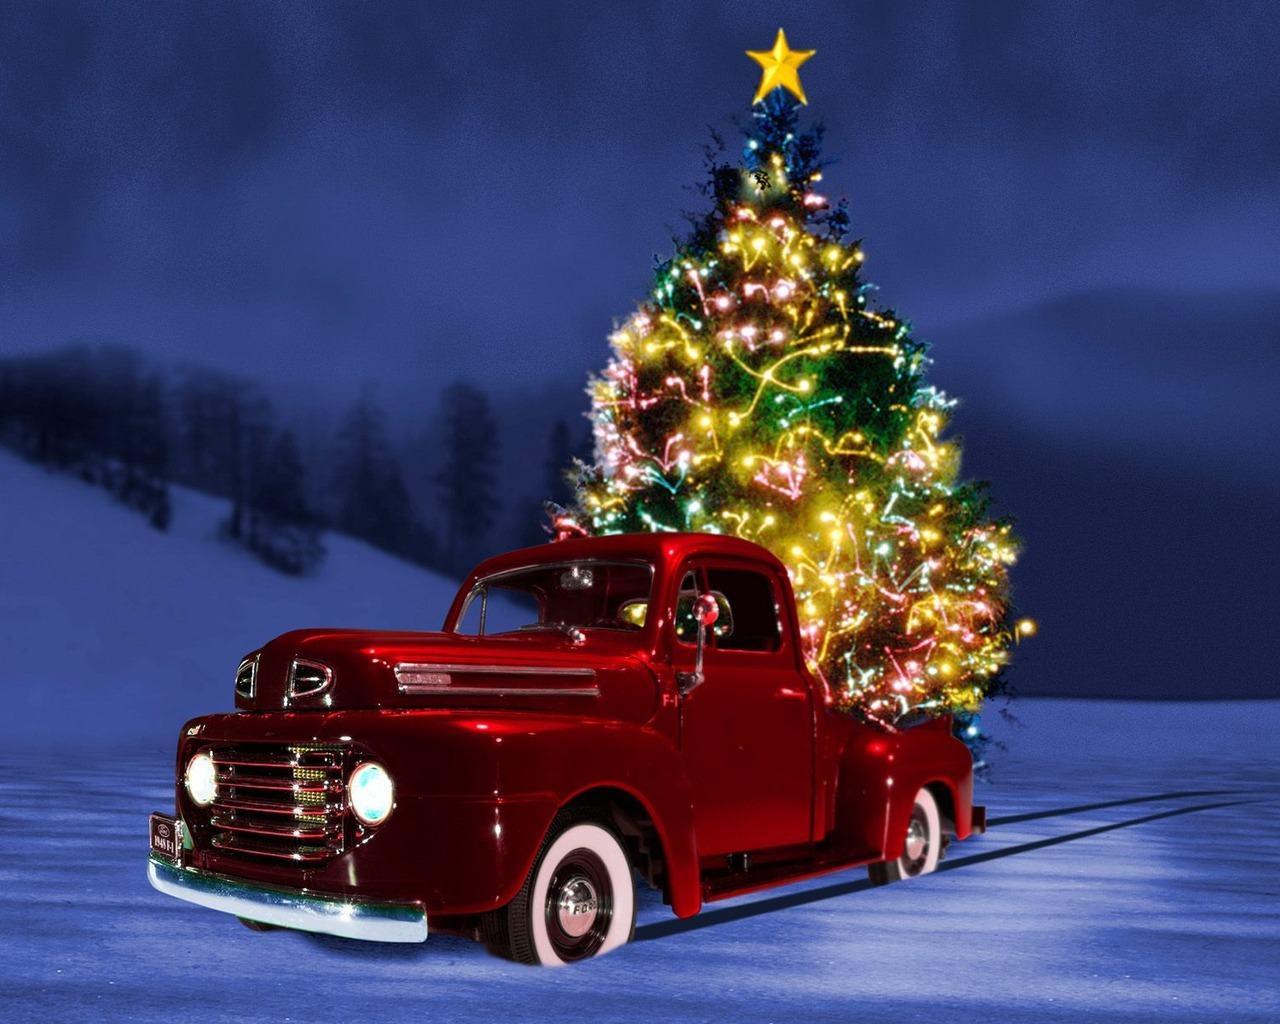 Christmas wallpaper backgrounds christmas wallpaper 1280x1024